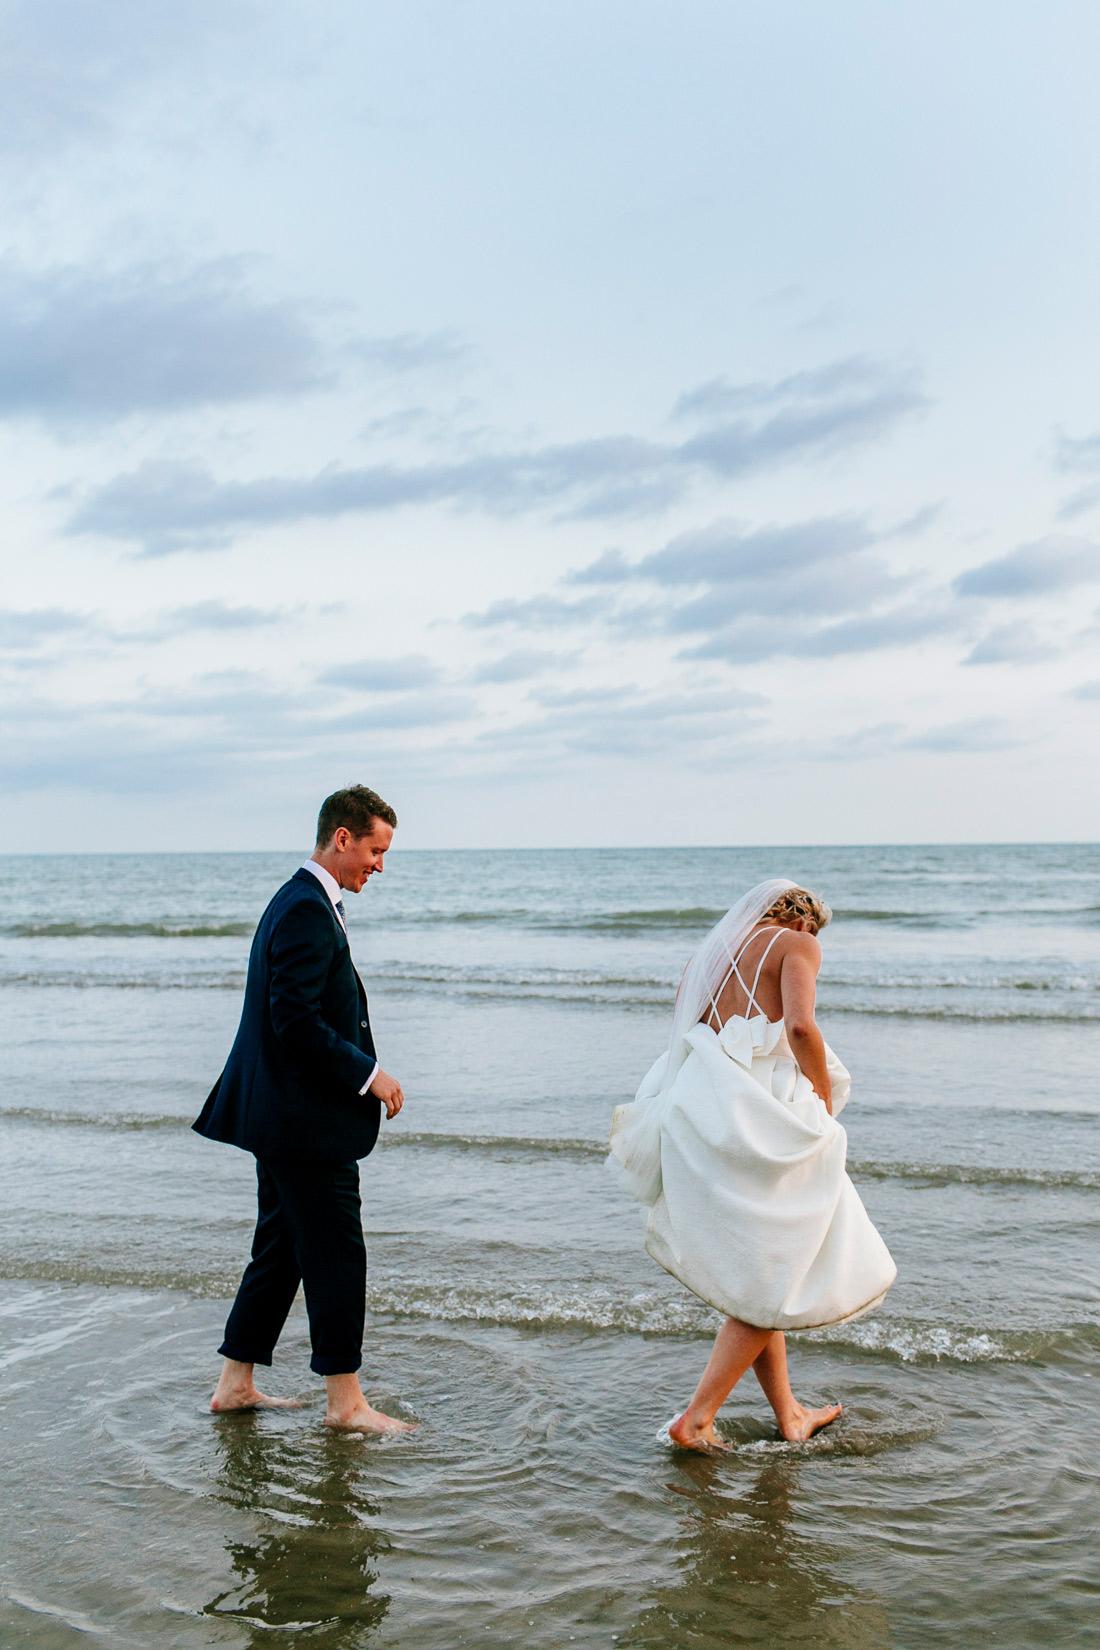 The-Gallivant-Camber-Sands-Beach-Kent-wedding-photographer-Epic-Love-Story-131